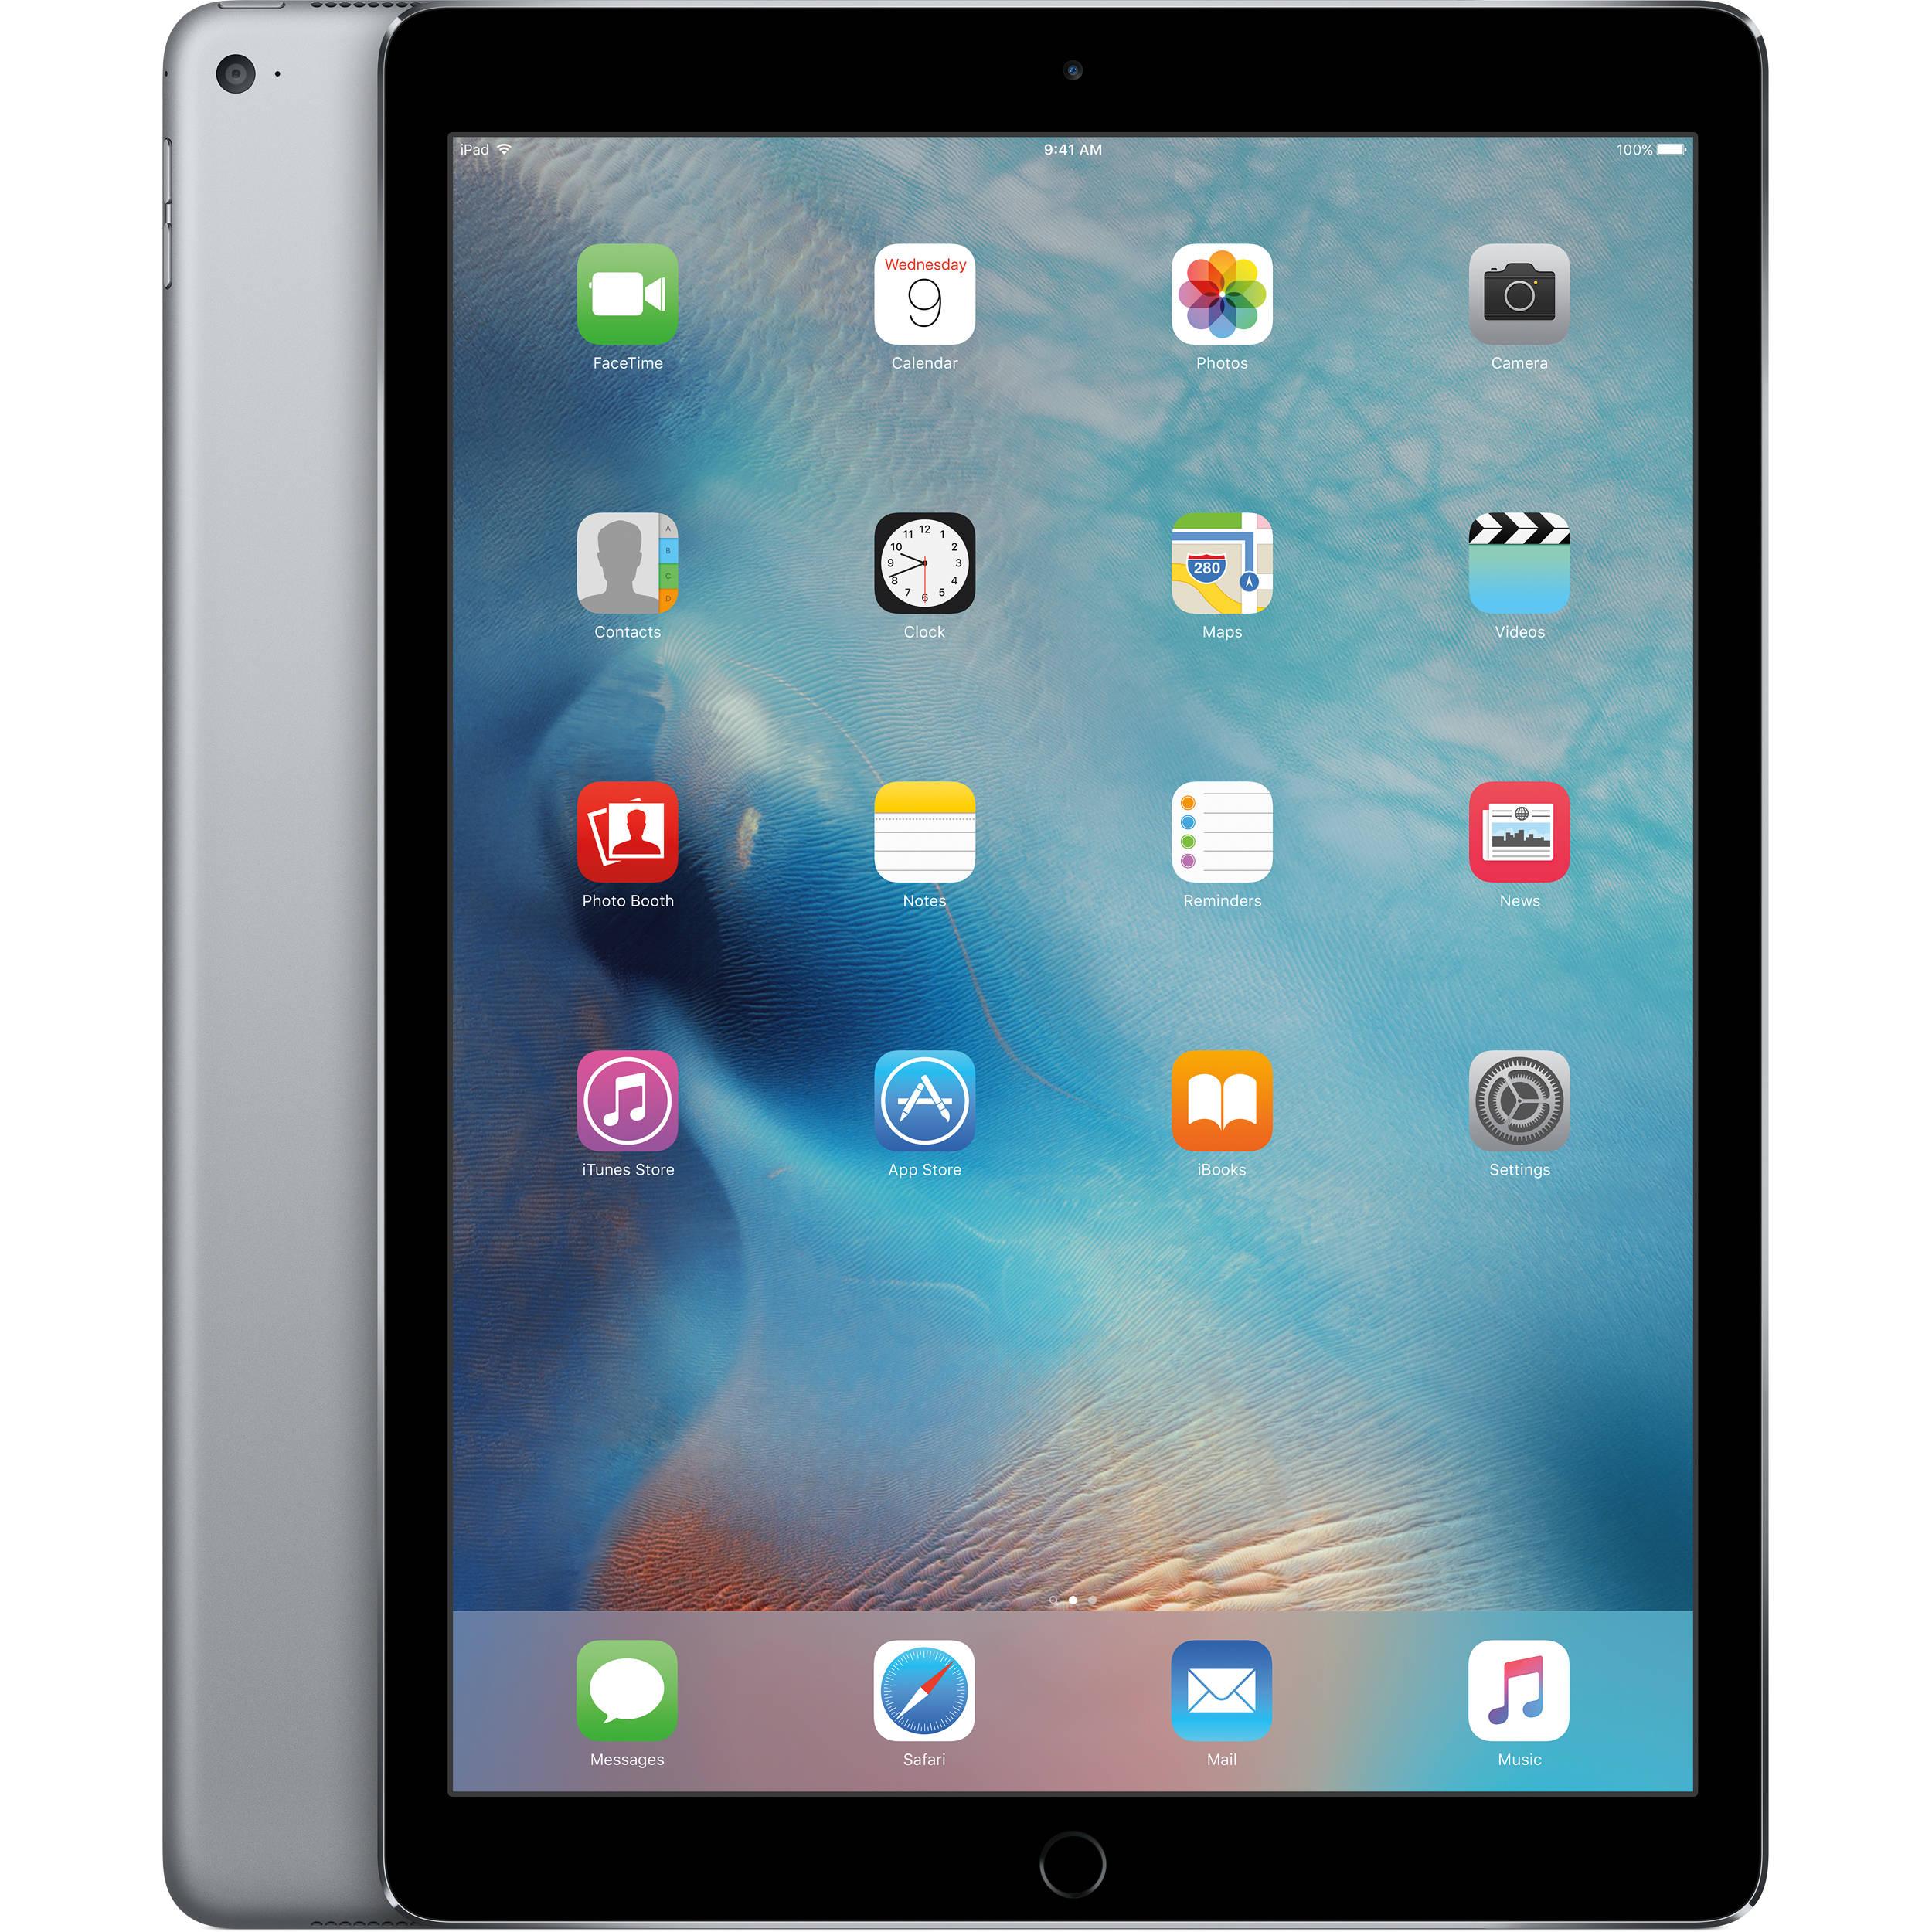 iPad Pro 12.9 inch